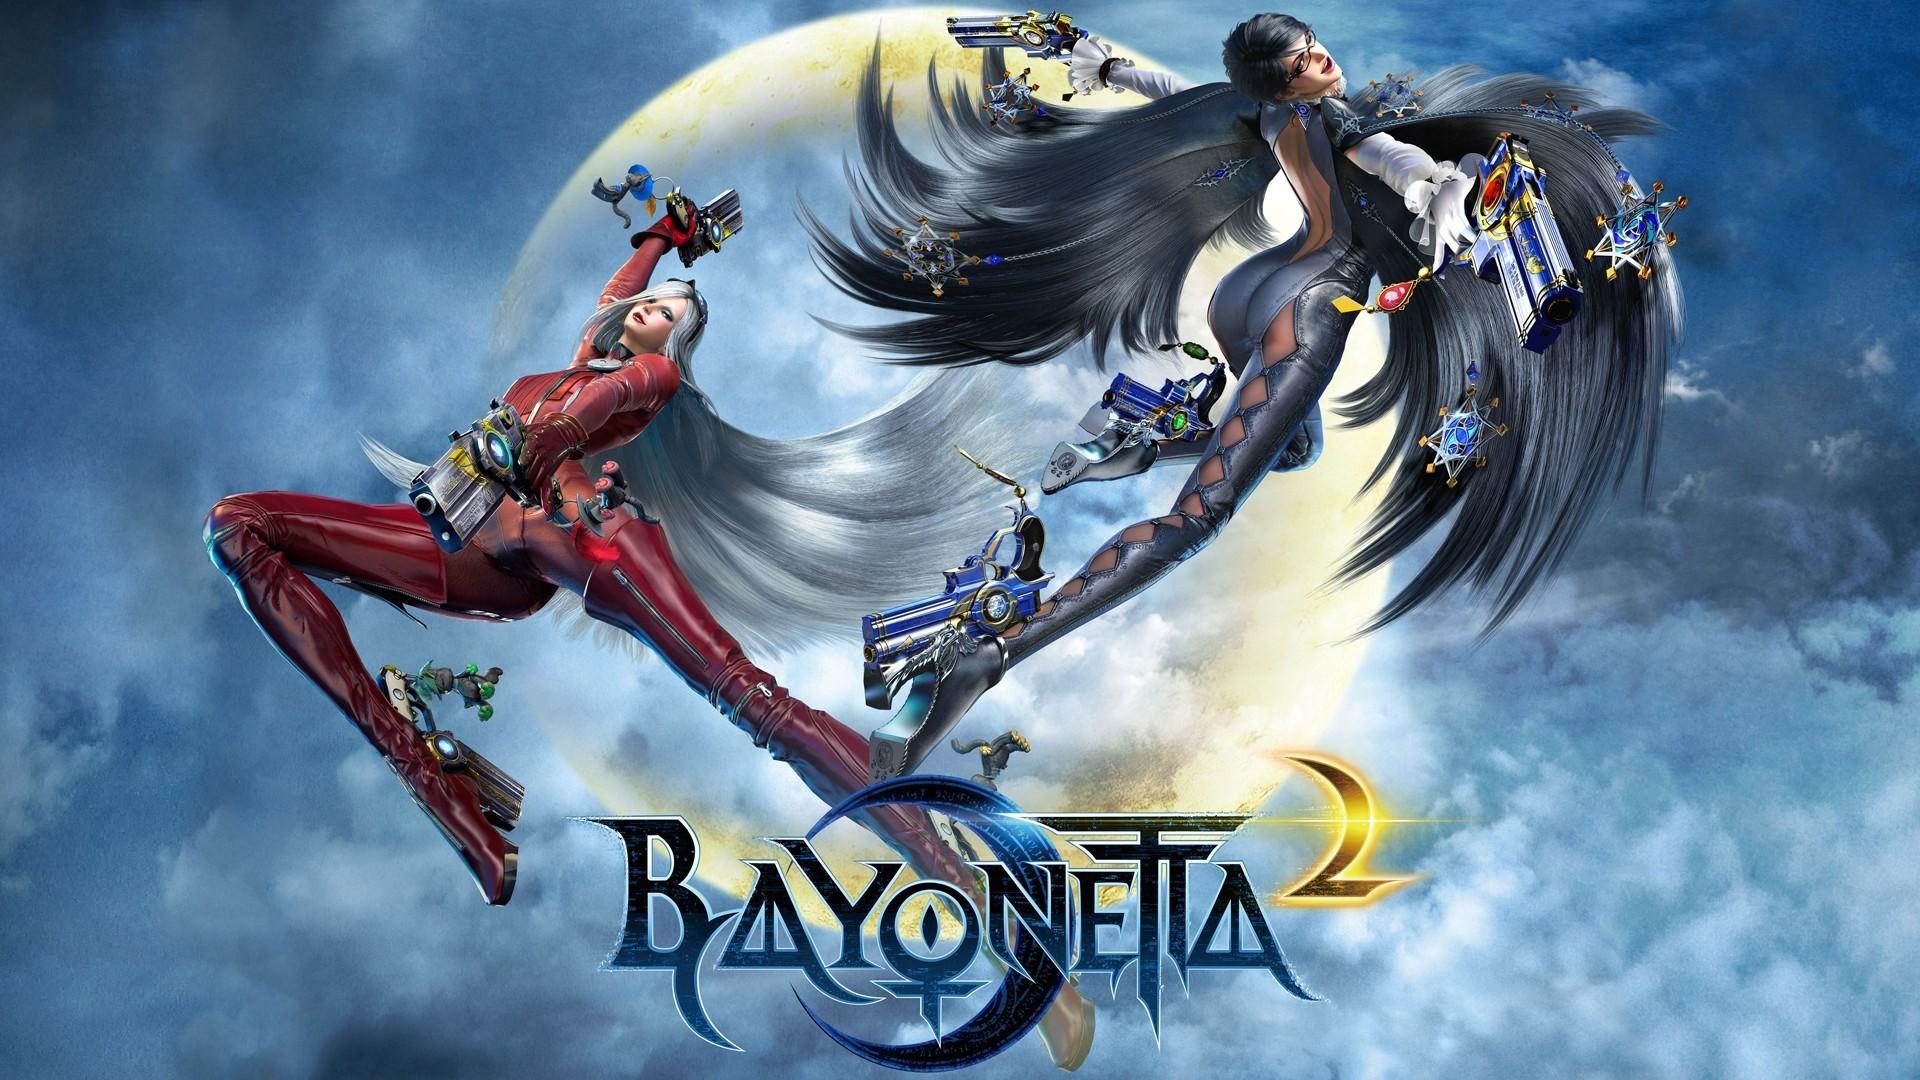 2016-11-12 – Bayonetta 2 wallpaper pack 1080p hd, #1307138